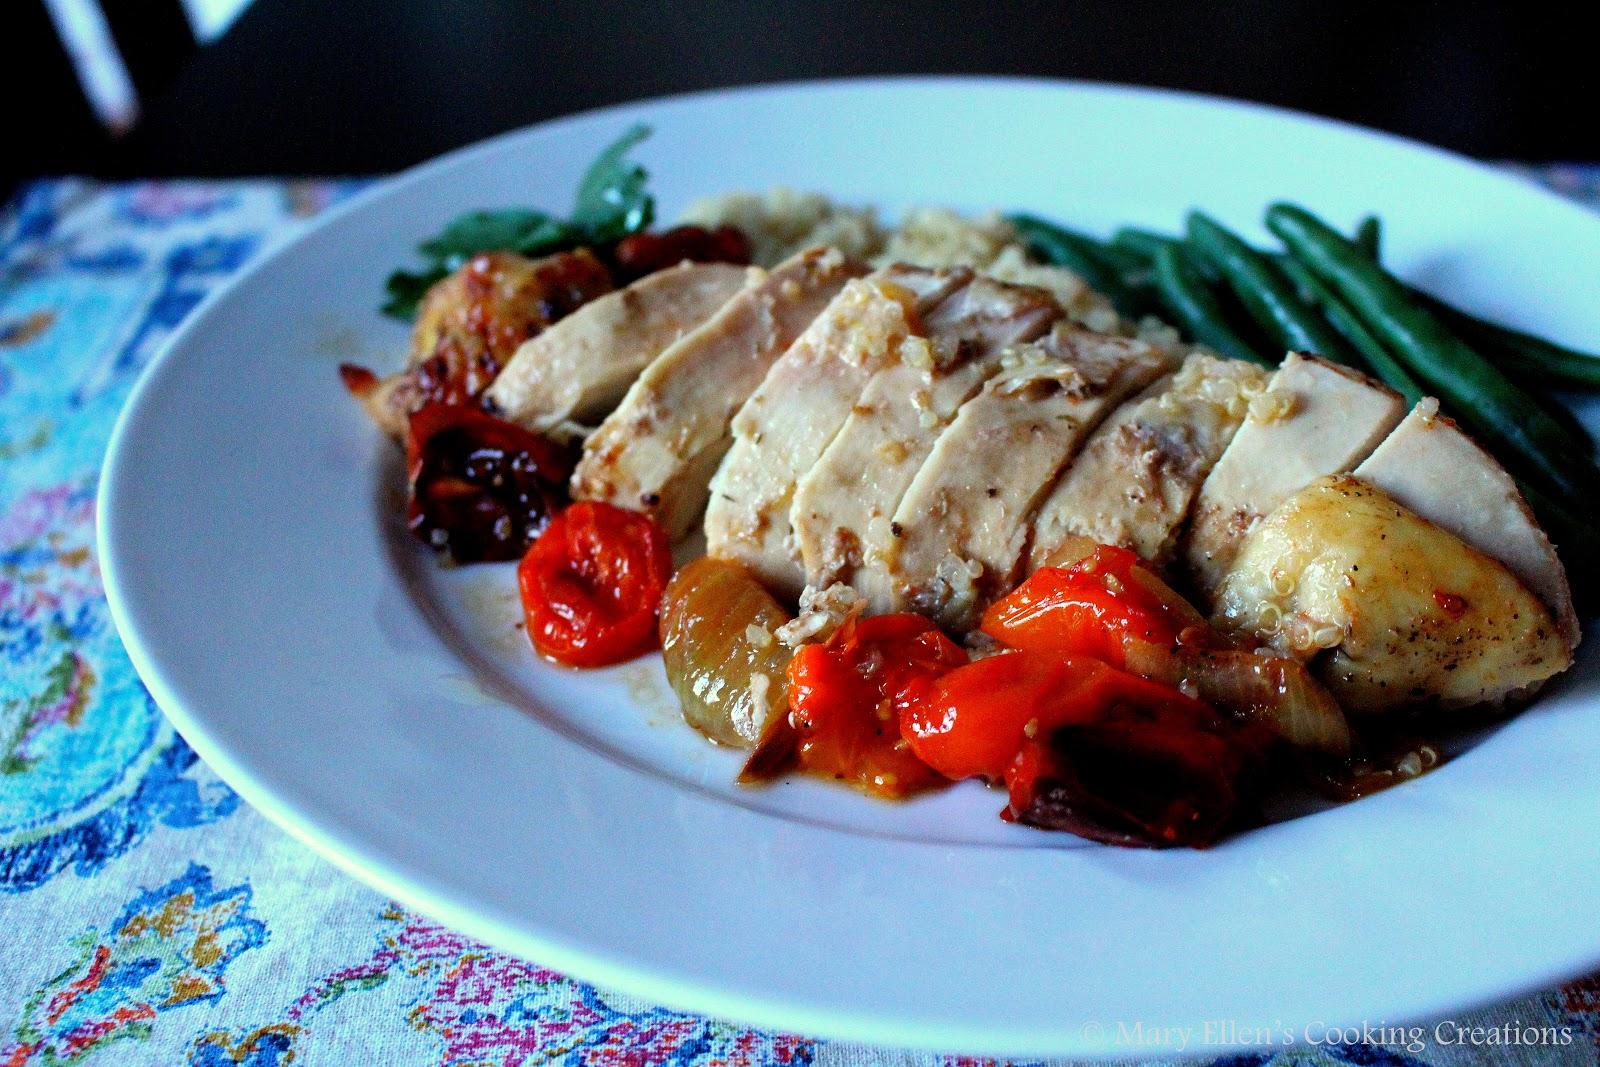 Mary Ellen's Cooking Creations: Lemon Garlic Roast Chicken ...